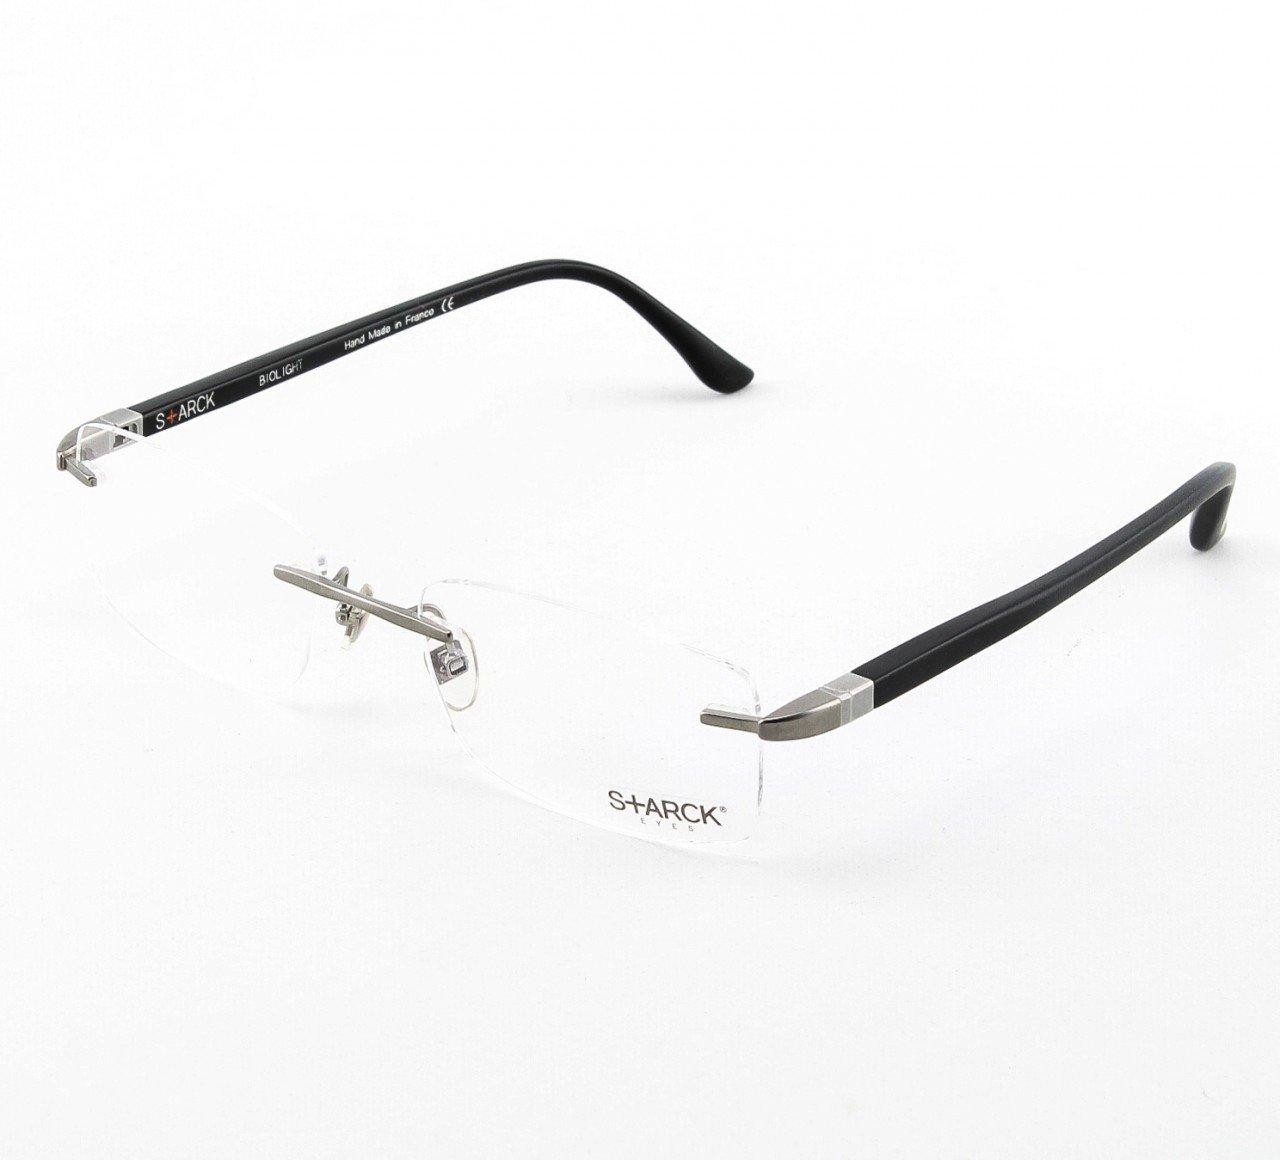 Starck Eyeglasses PL0906 Col. 04 Black with Clear Lenses